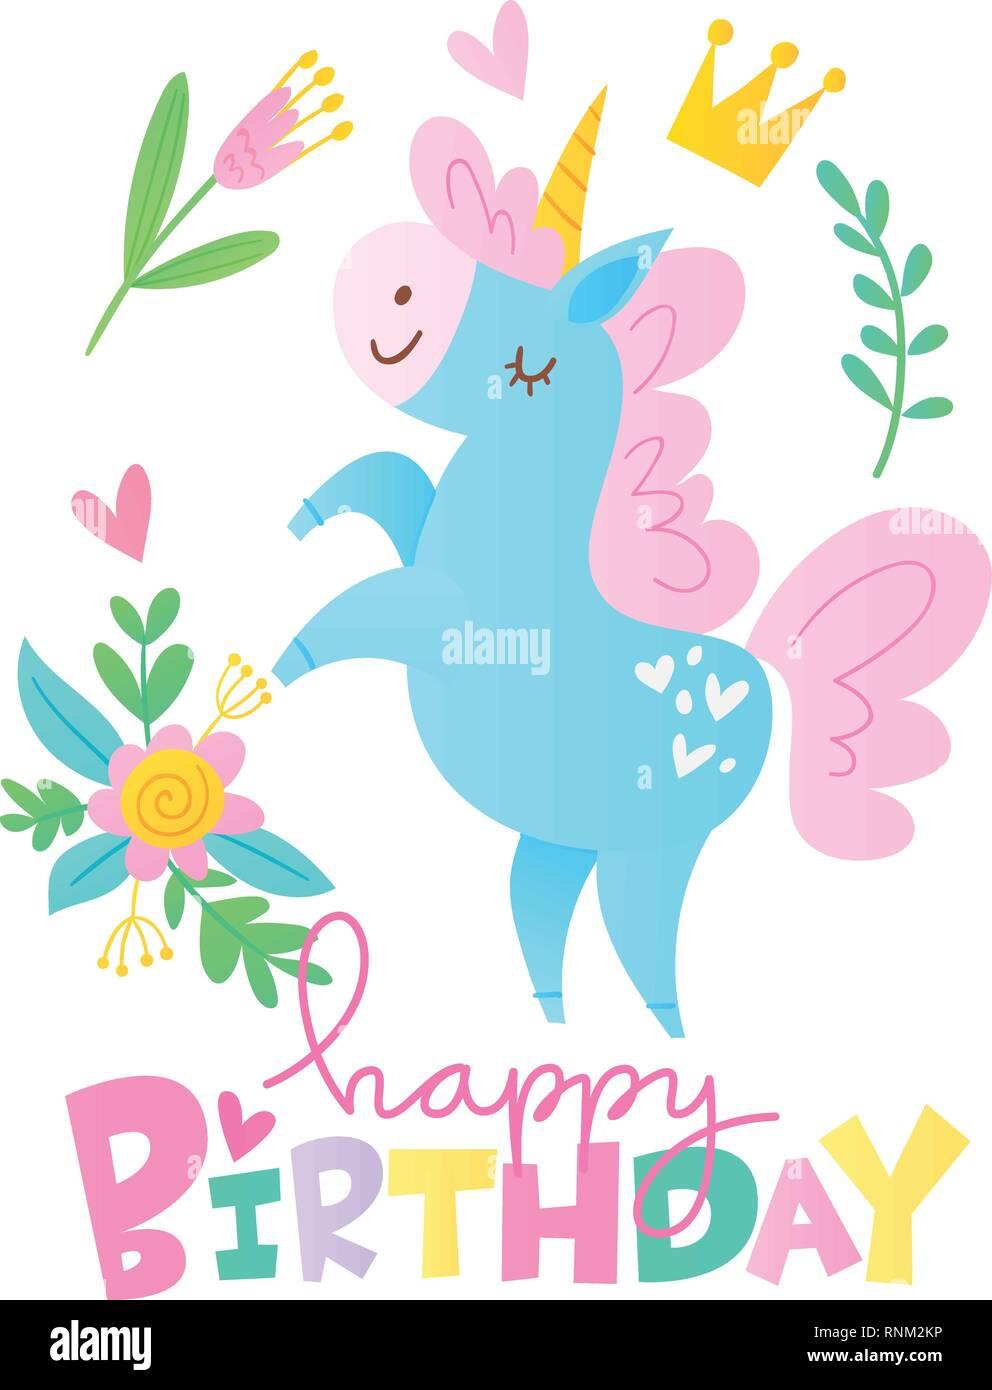 Vektor Happy Birthday Cards mit cartoon Einhorn Charakter Stock Vektor